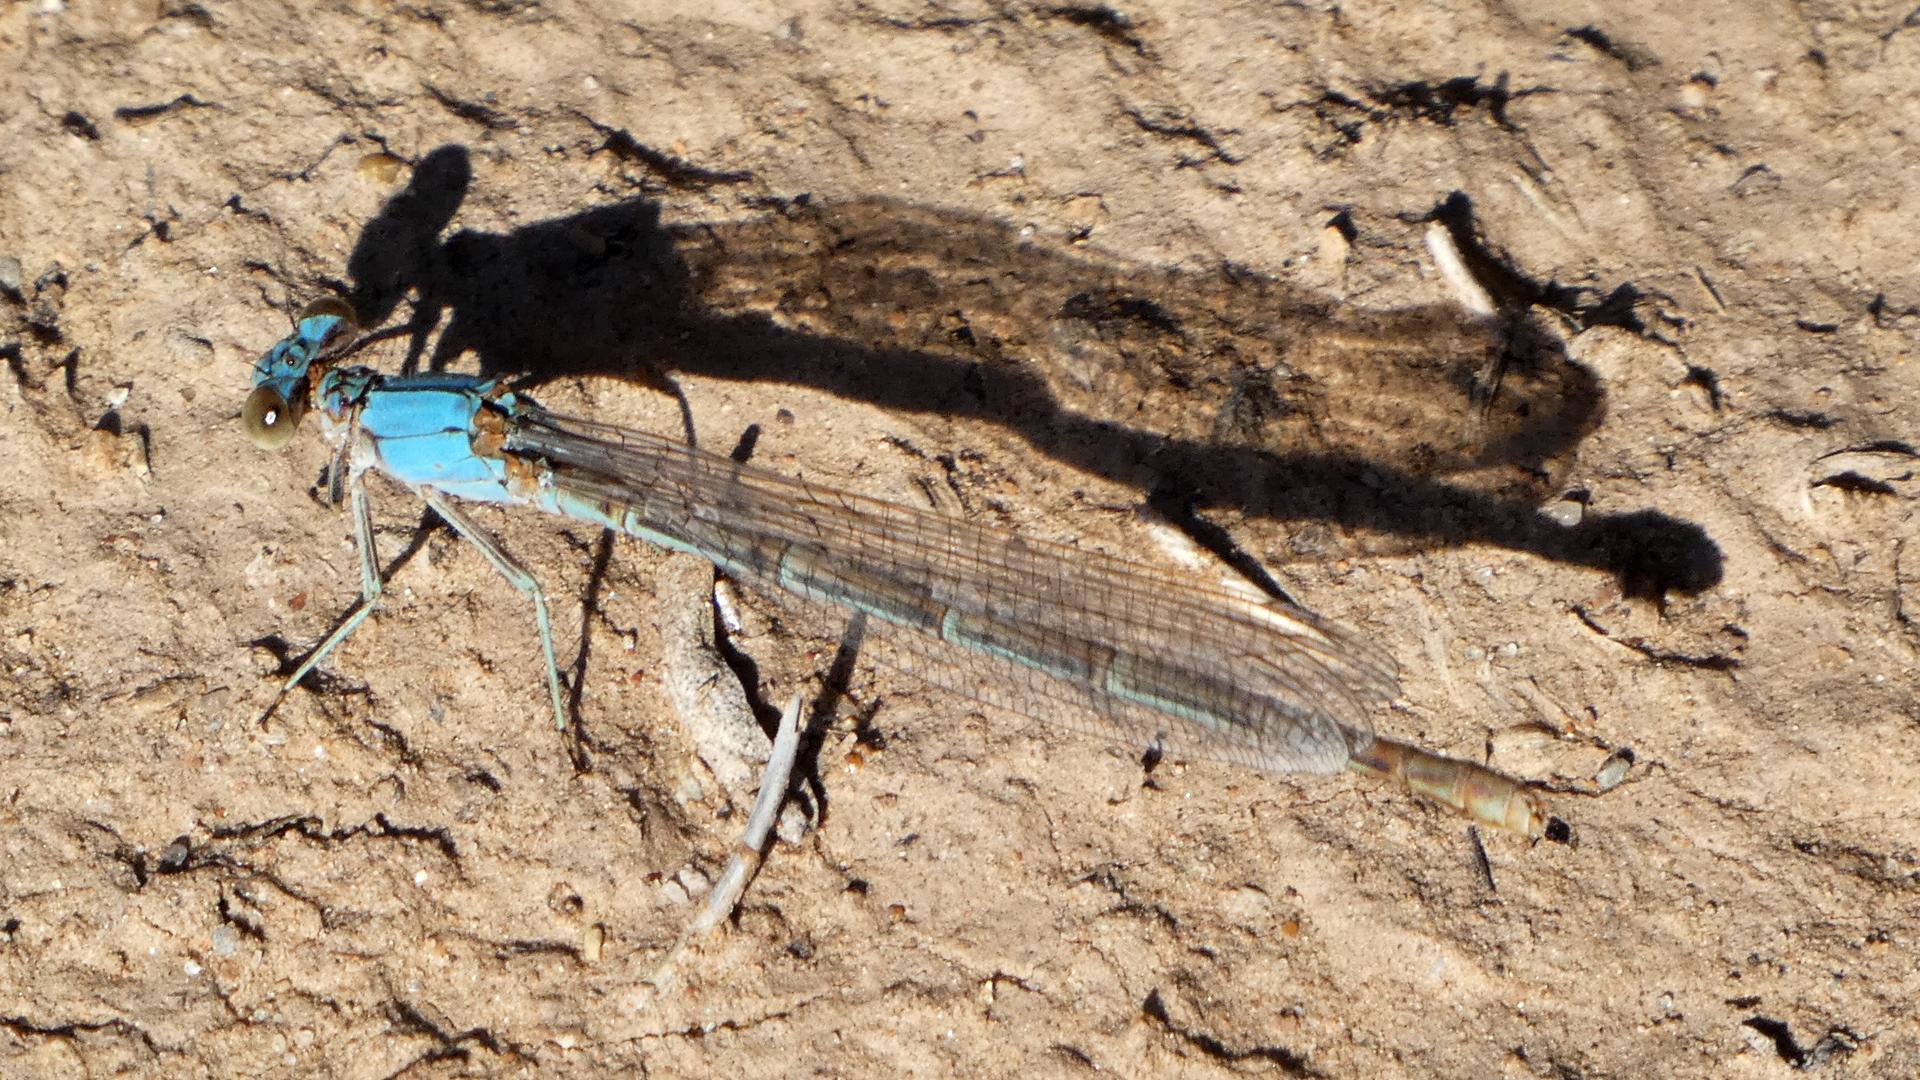 Blue form female, Albuquerque, July 2021